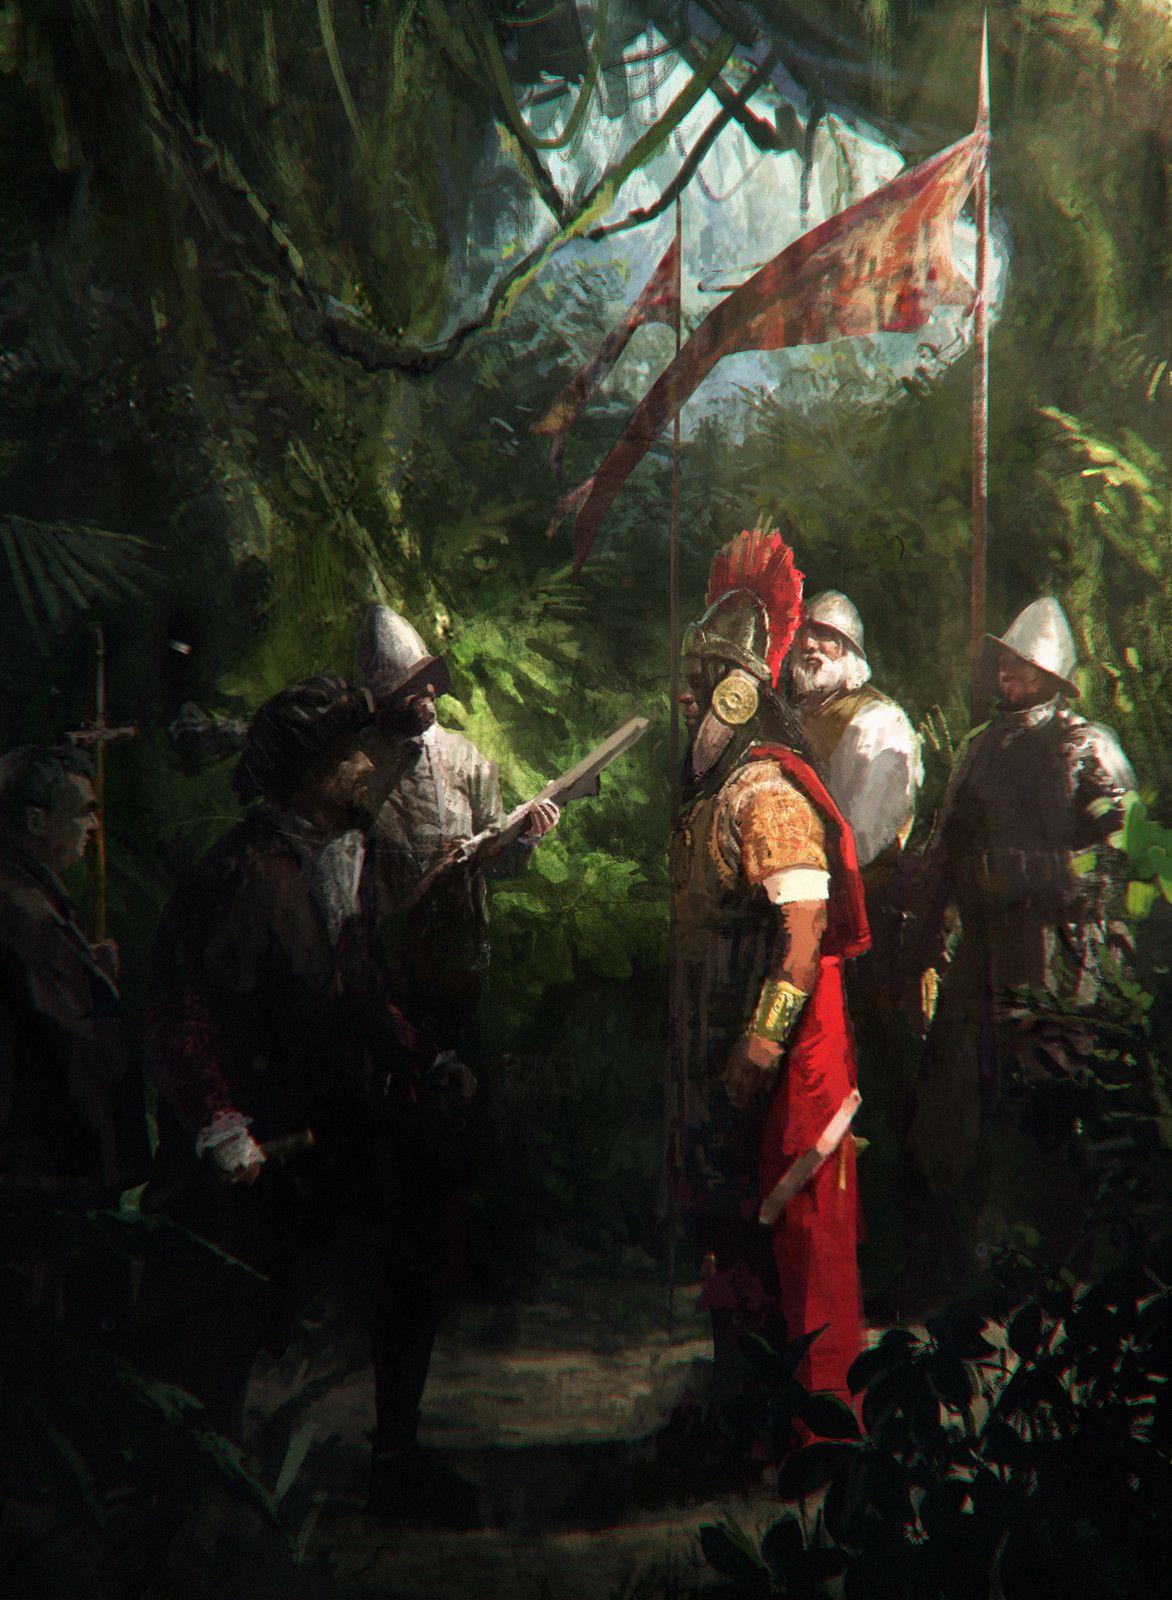 Royal Hunt of the Sun, Saby Menyhei on ArtStation at https://www.artstation.com/artwork/R5BQy